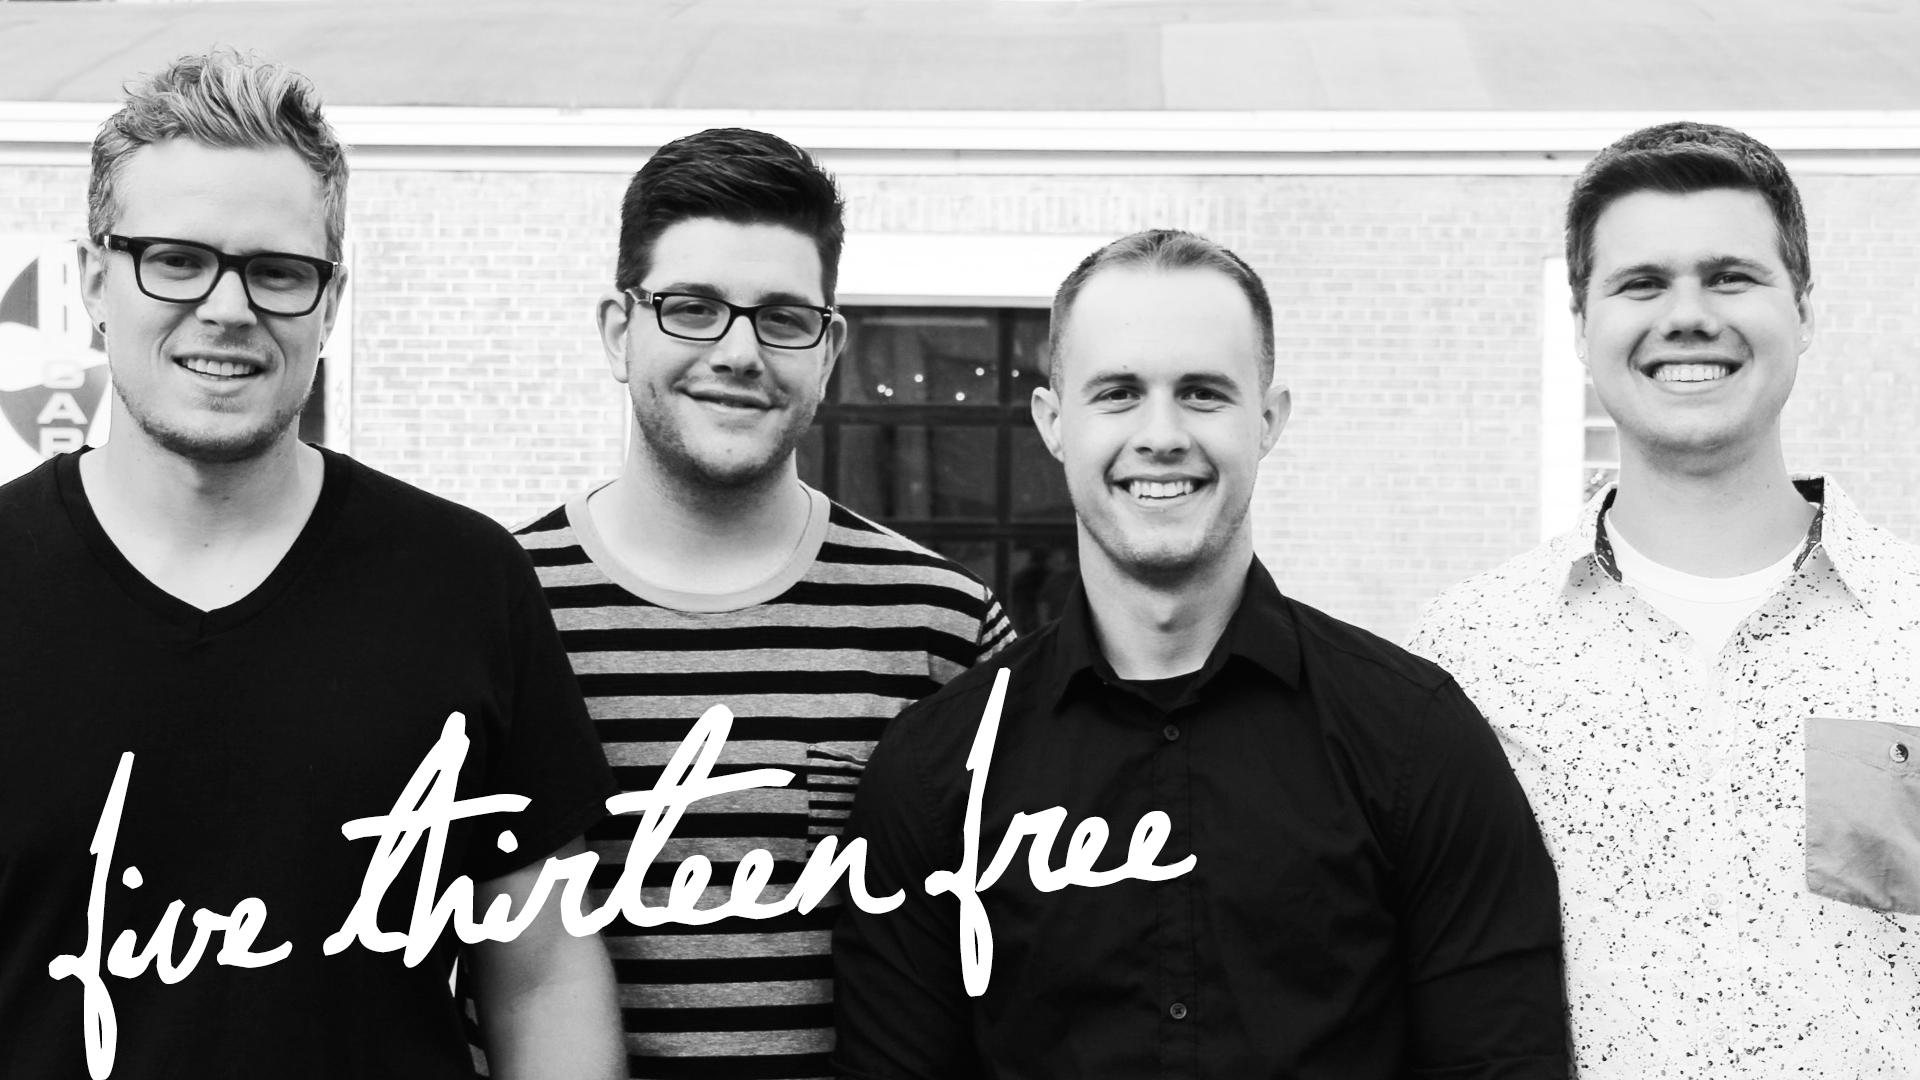 Jesse, Jonny, Nate & Michael